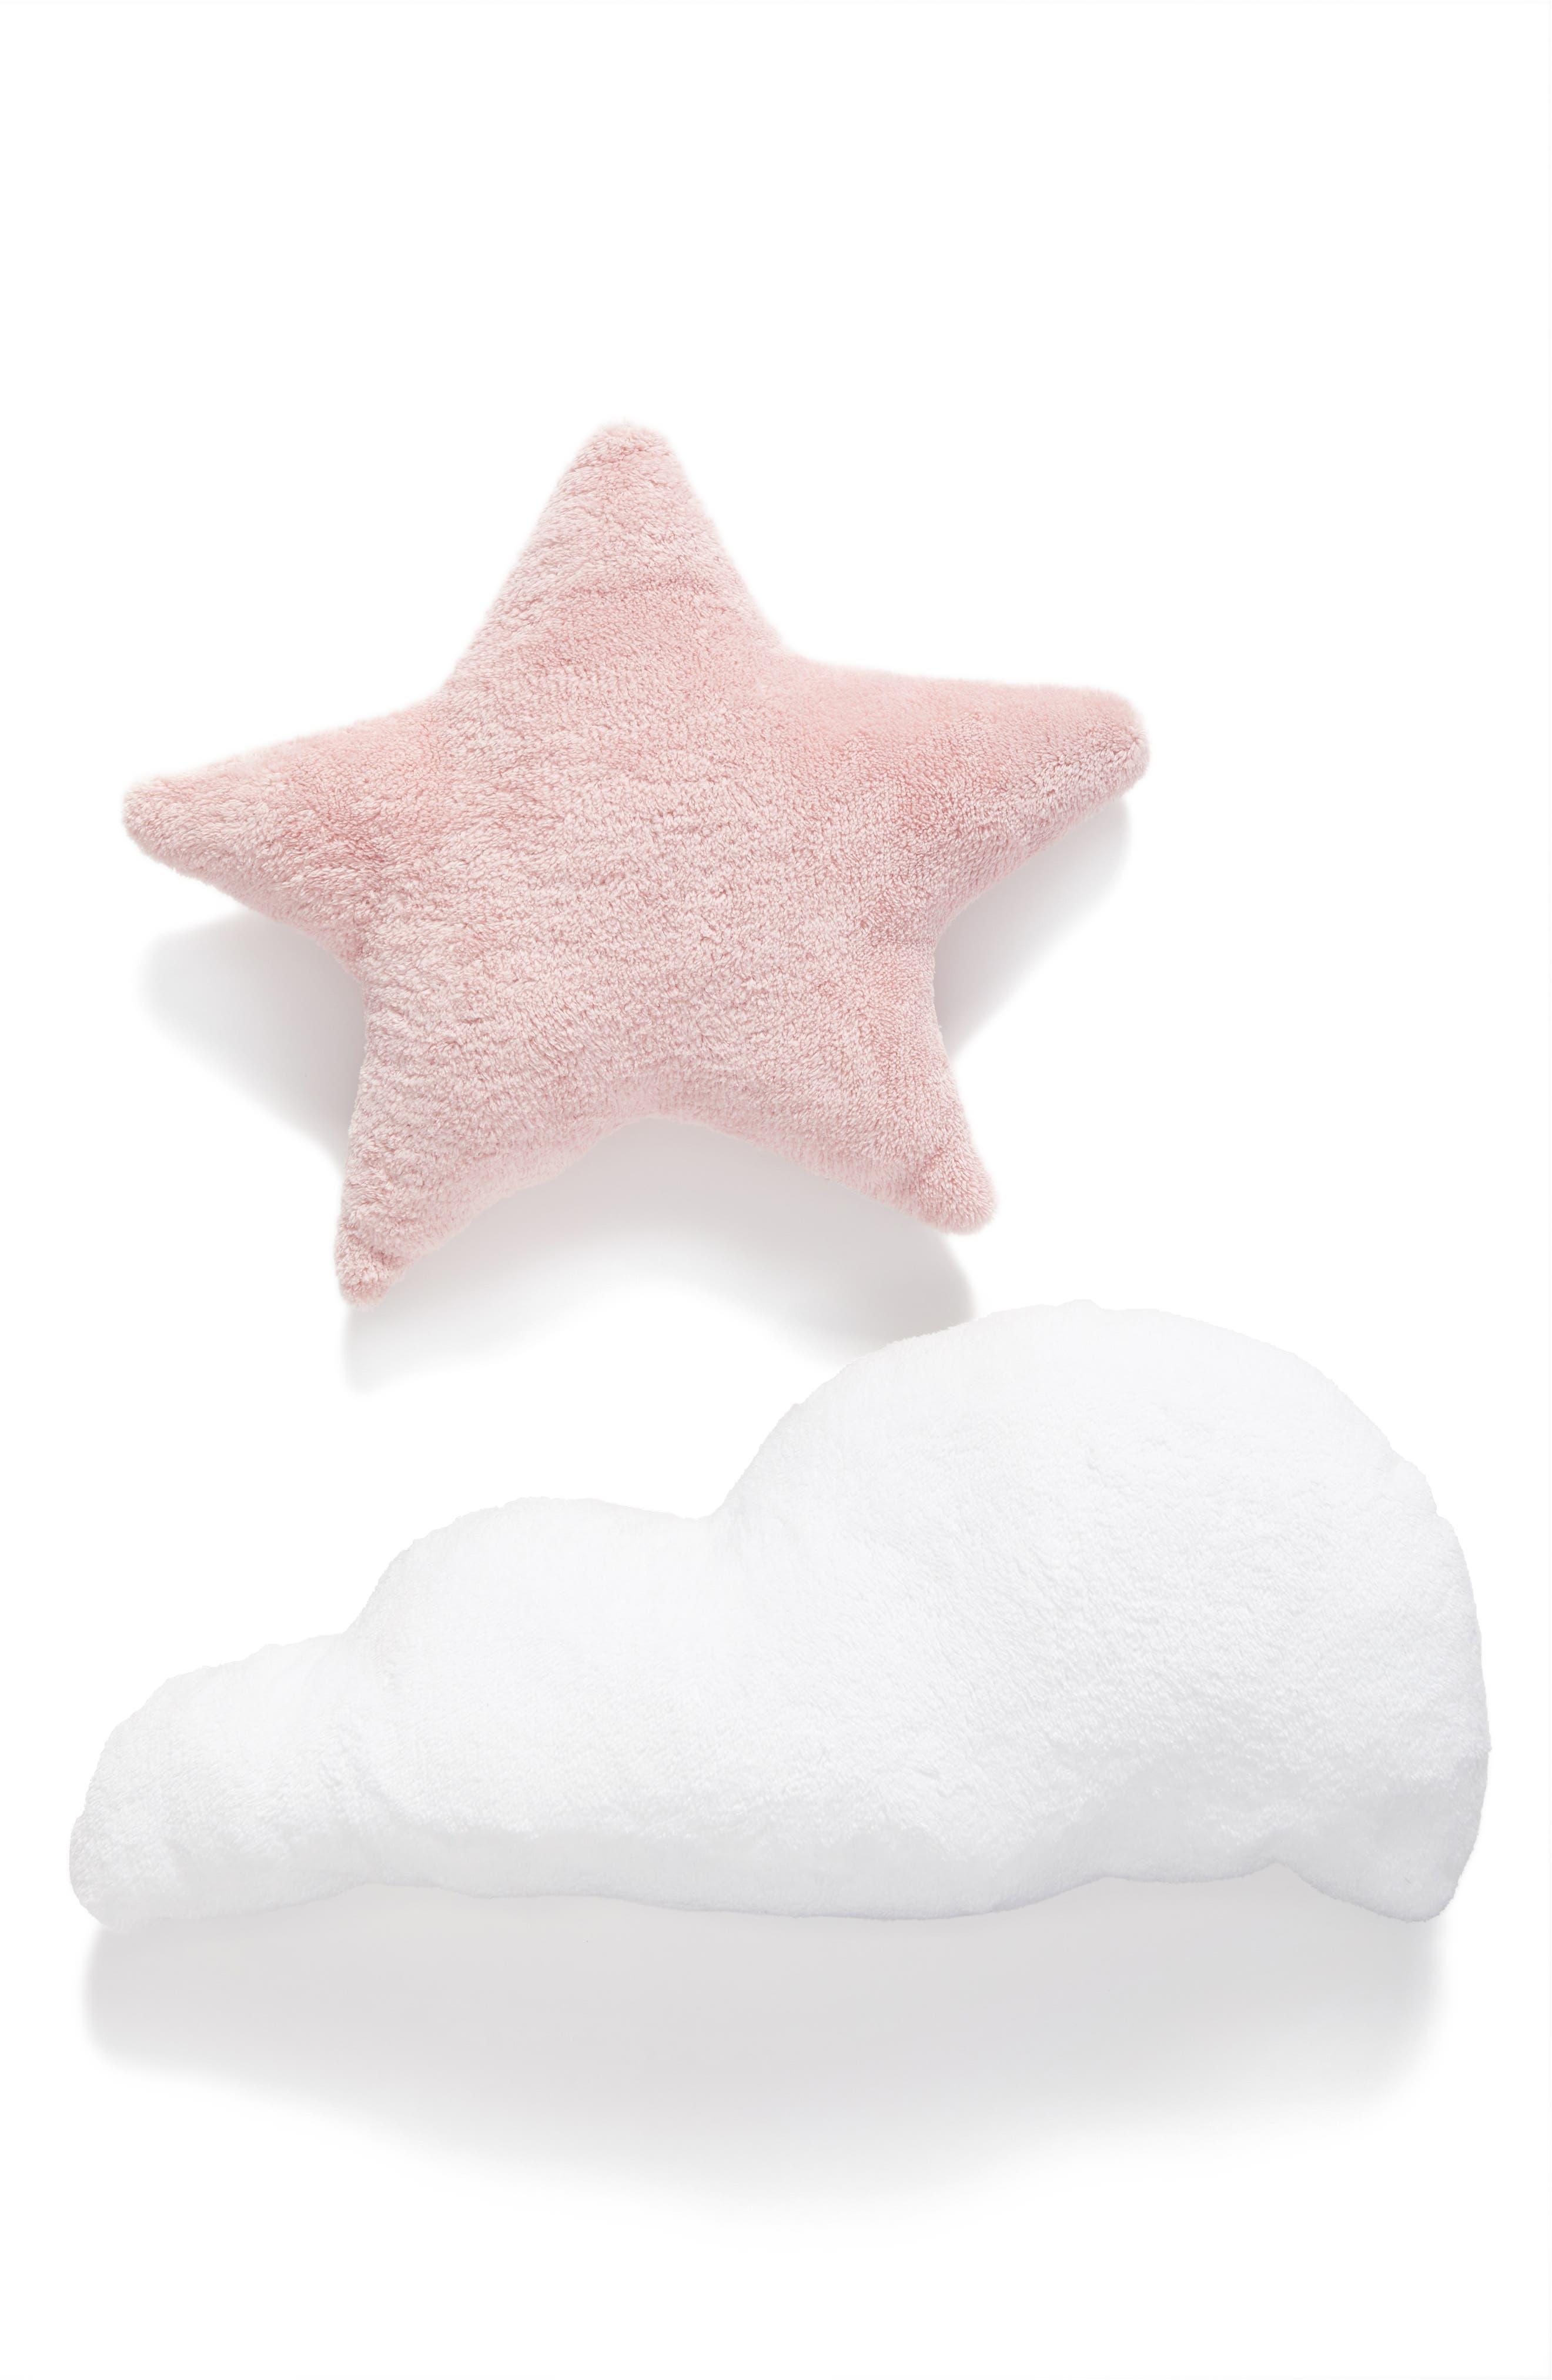 Main Image - Oilo Cloud & Star Pillows